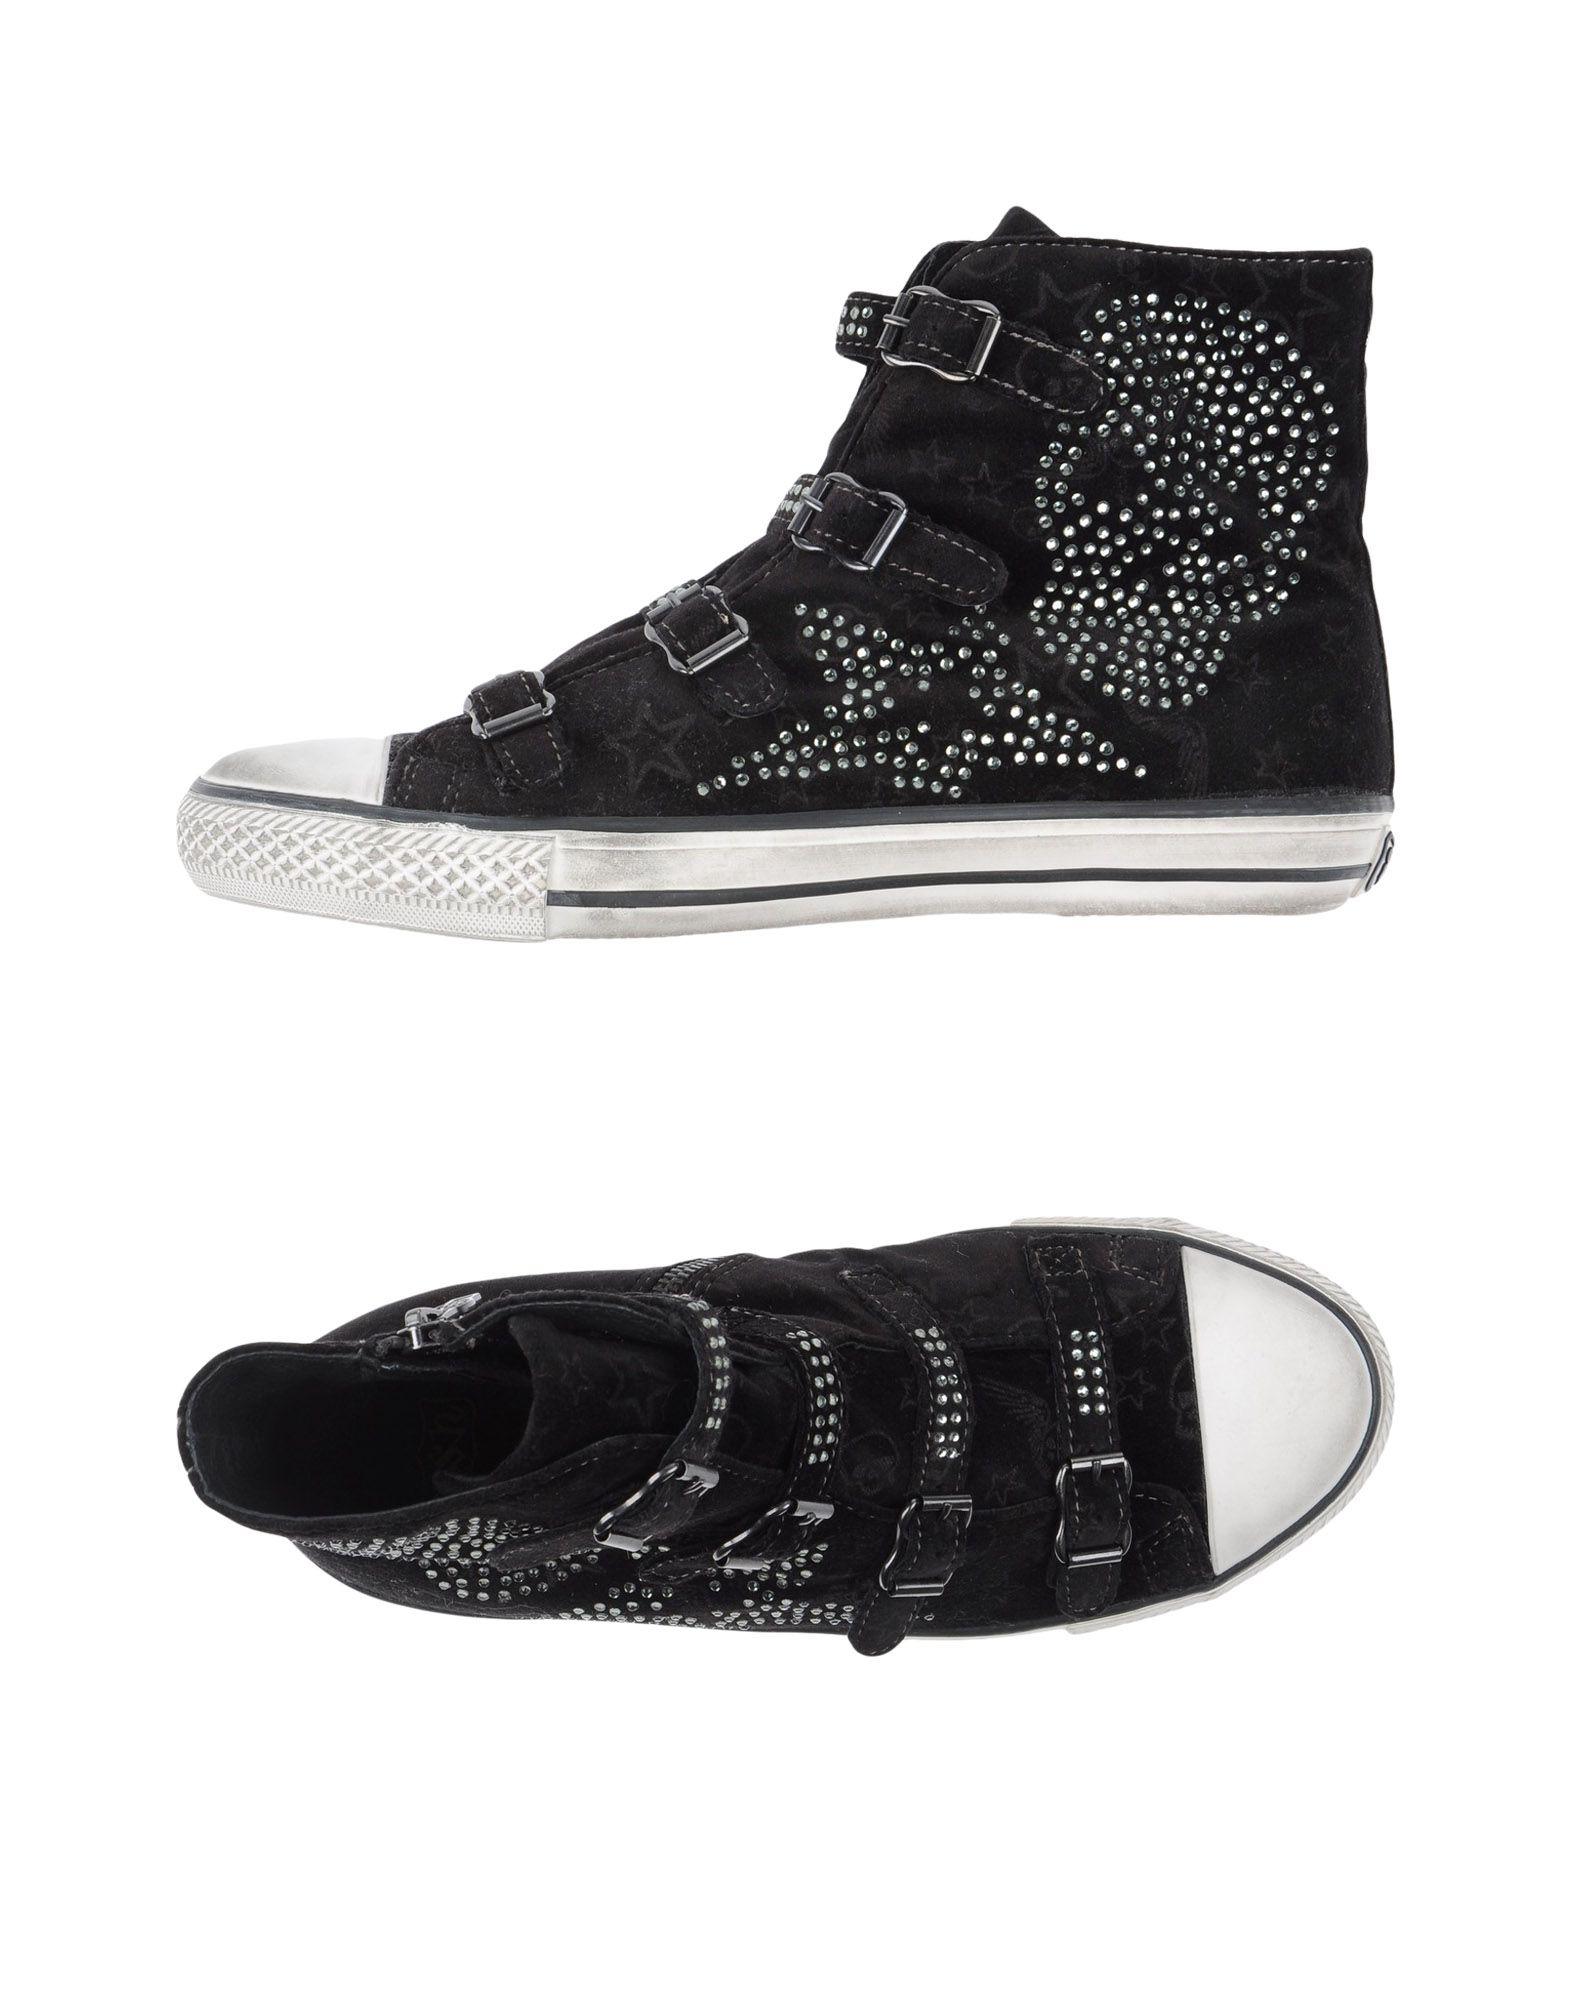 Moda Sneakers Ash Donna Donna Ash - 11246922BI b08990